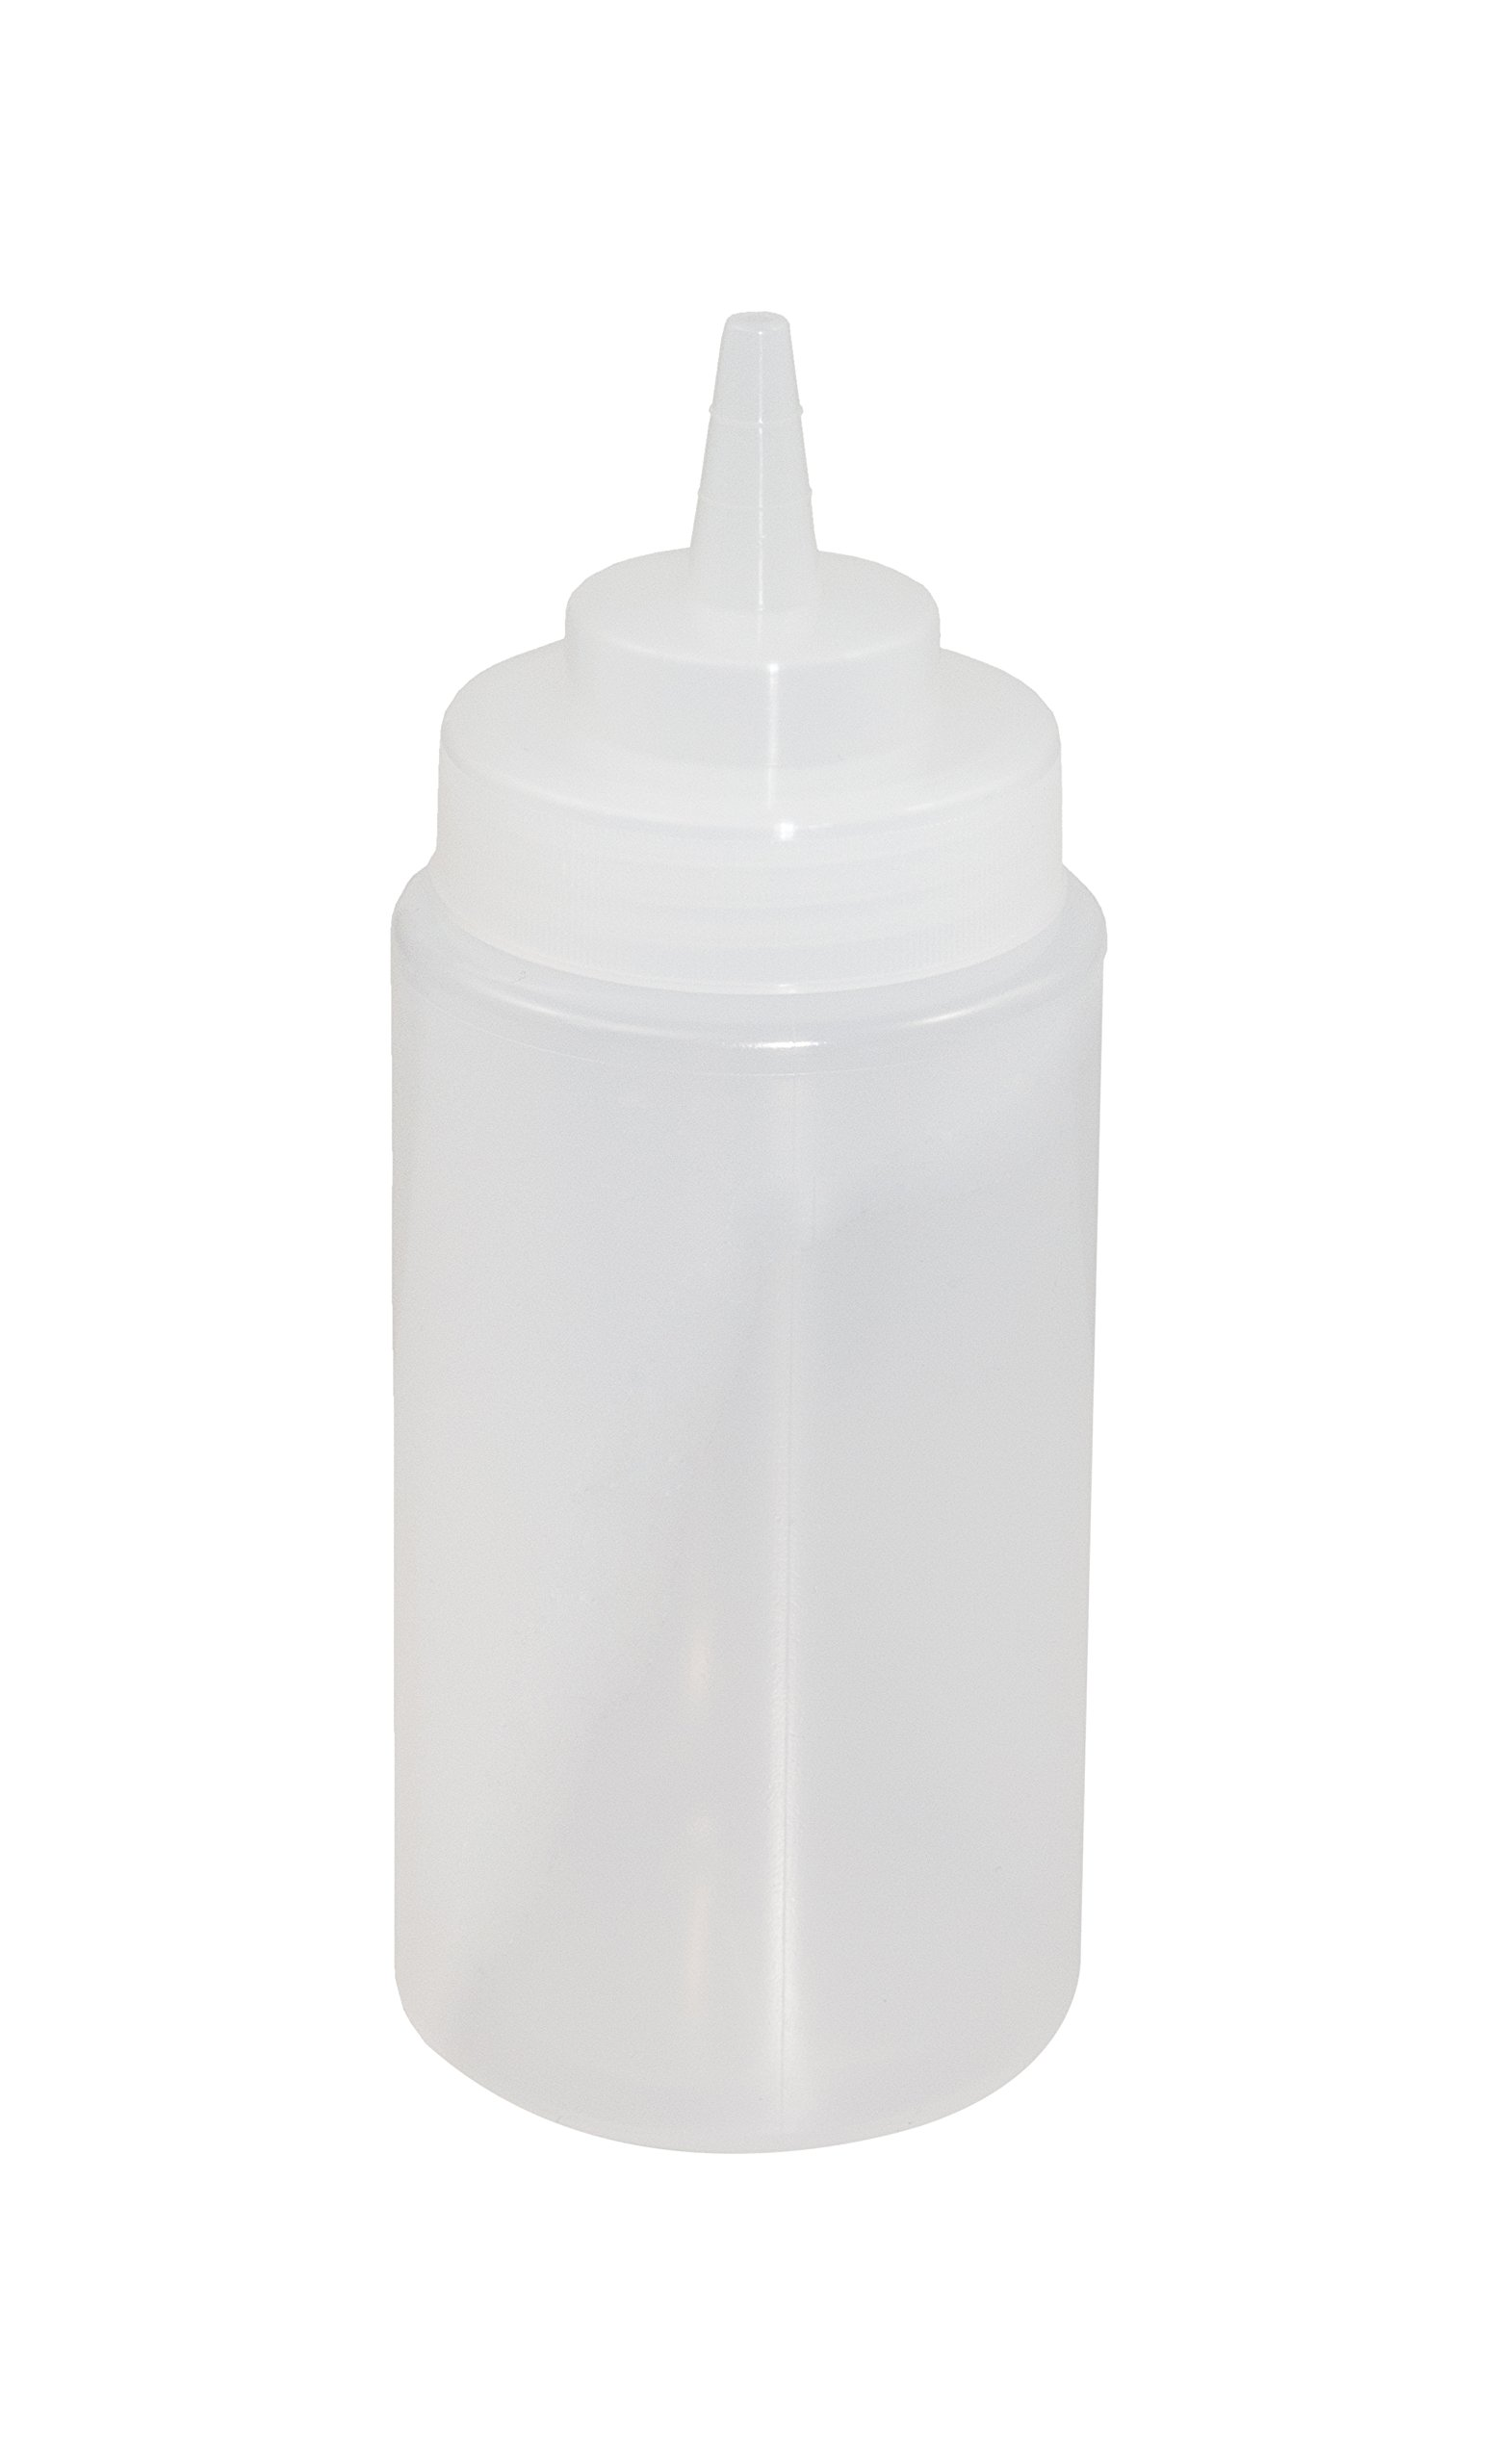 Crestware SB16CW Squeeze Wide Mouth Bottle, 16 oz, Clear by CRESTWARE